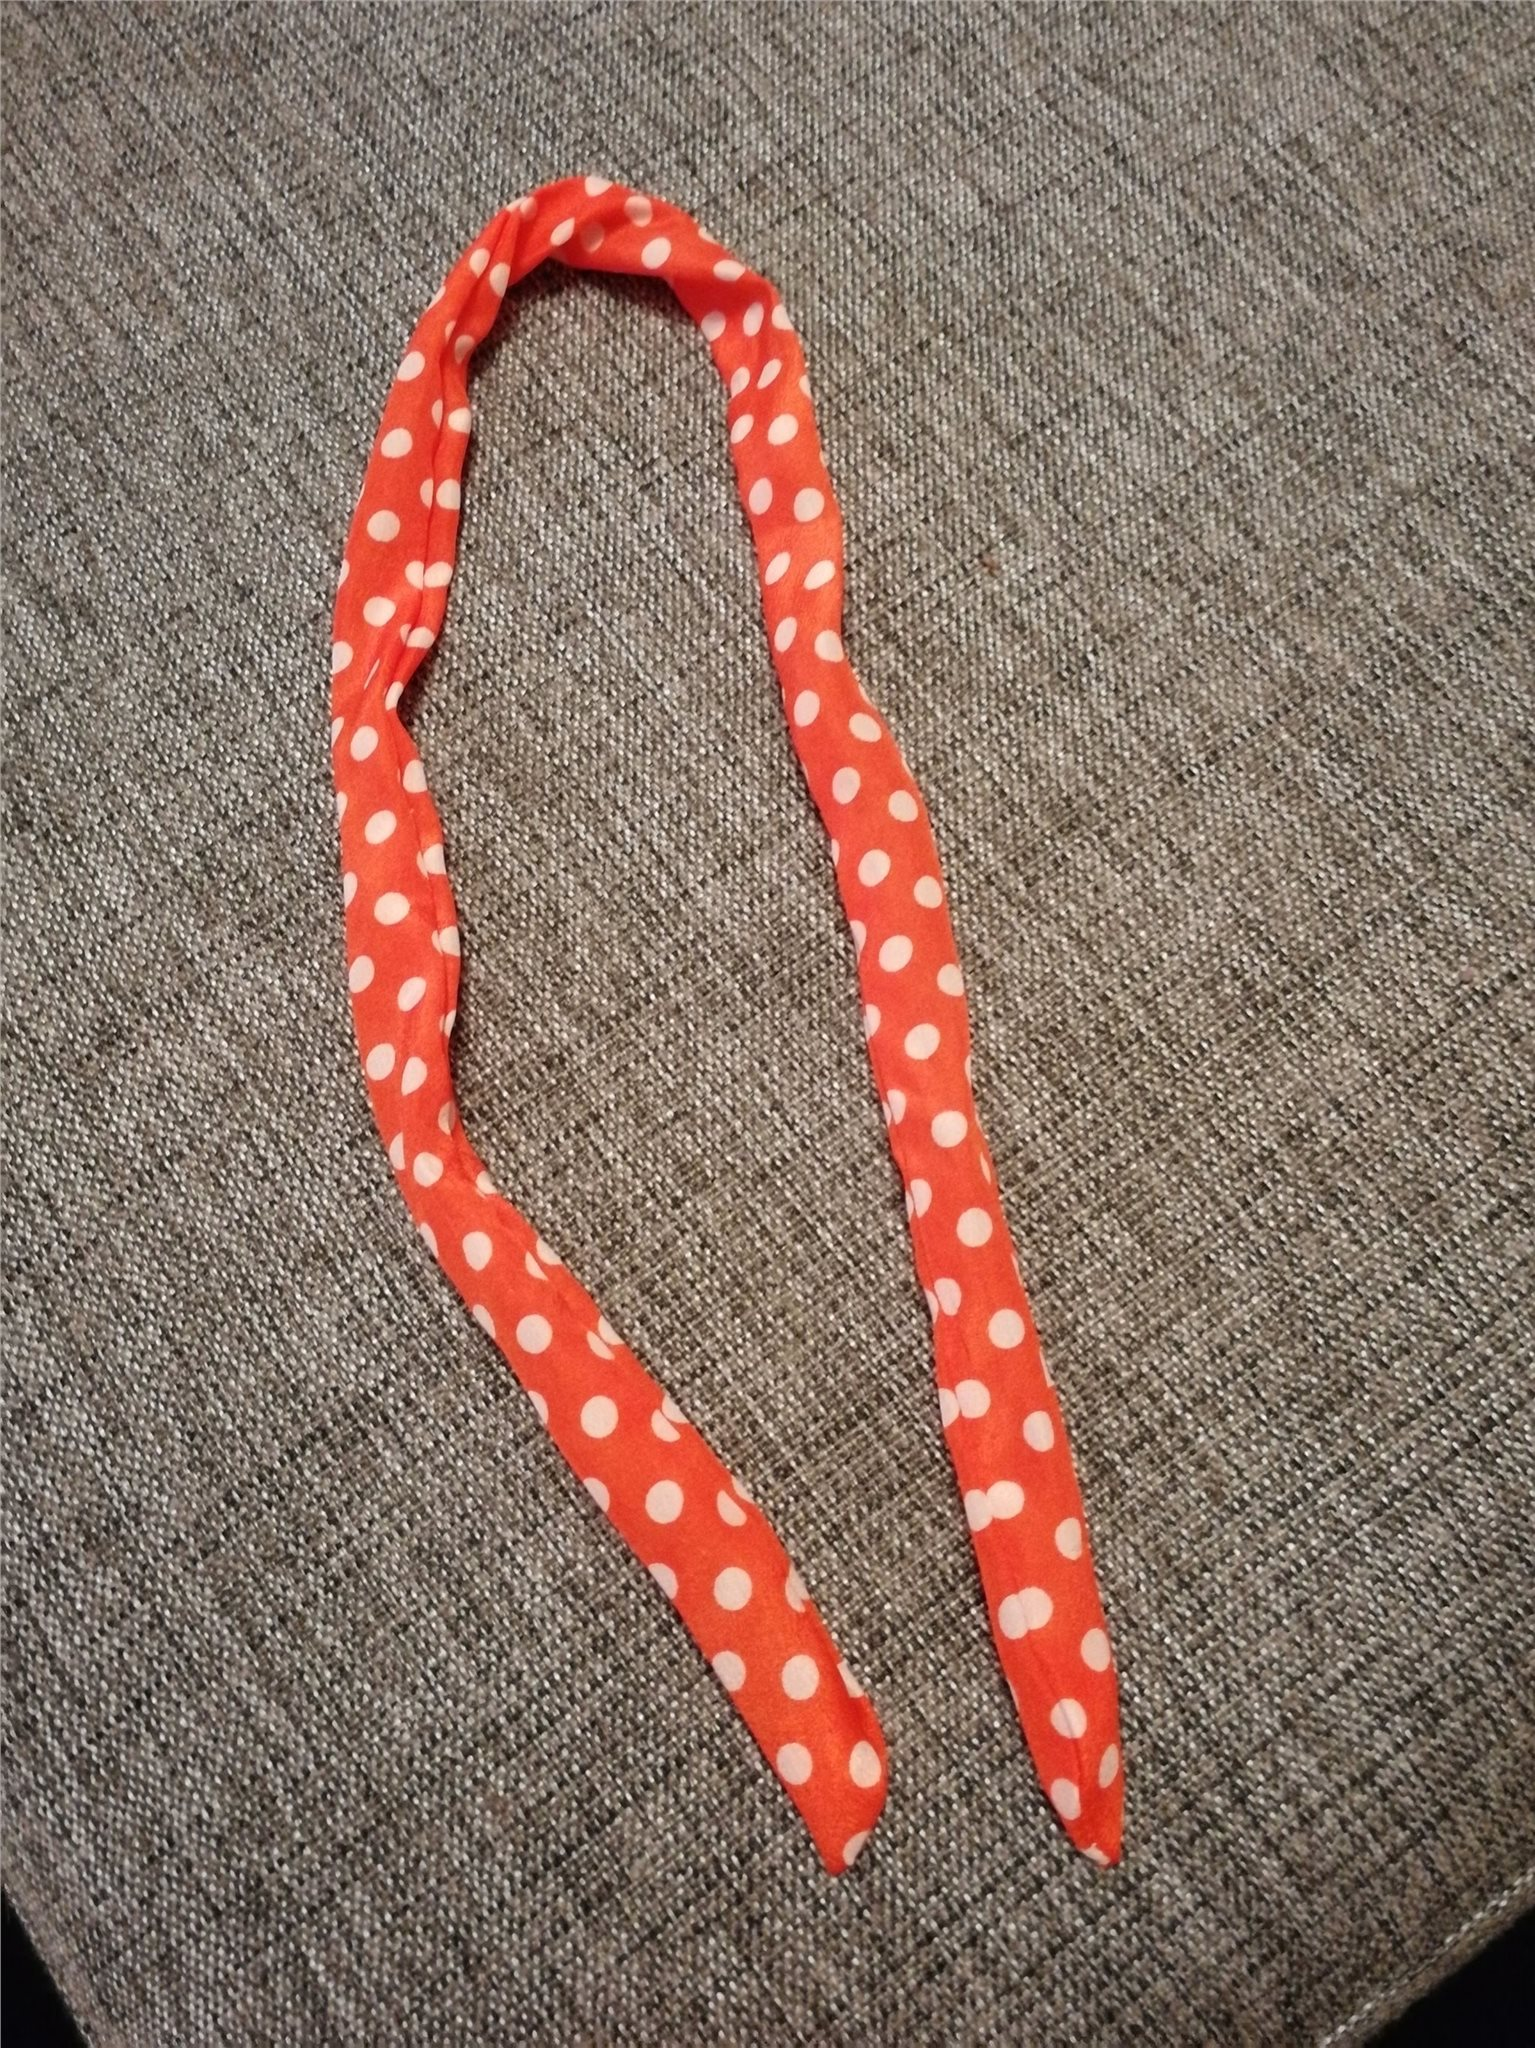 the latest 85484 7159e Nytt hårband bandana rockabilly-stil, polkadot, prickar, pinuppa, ...